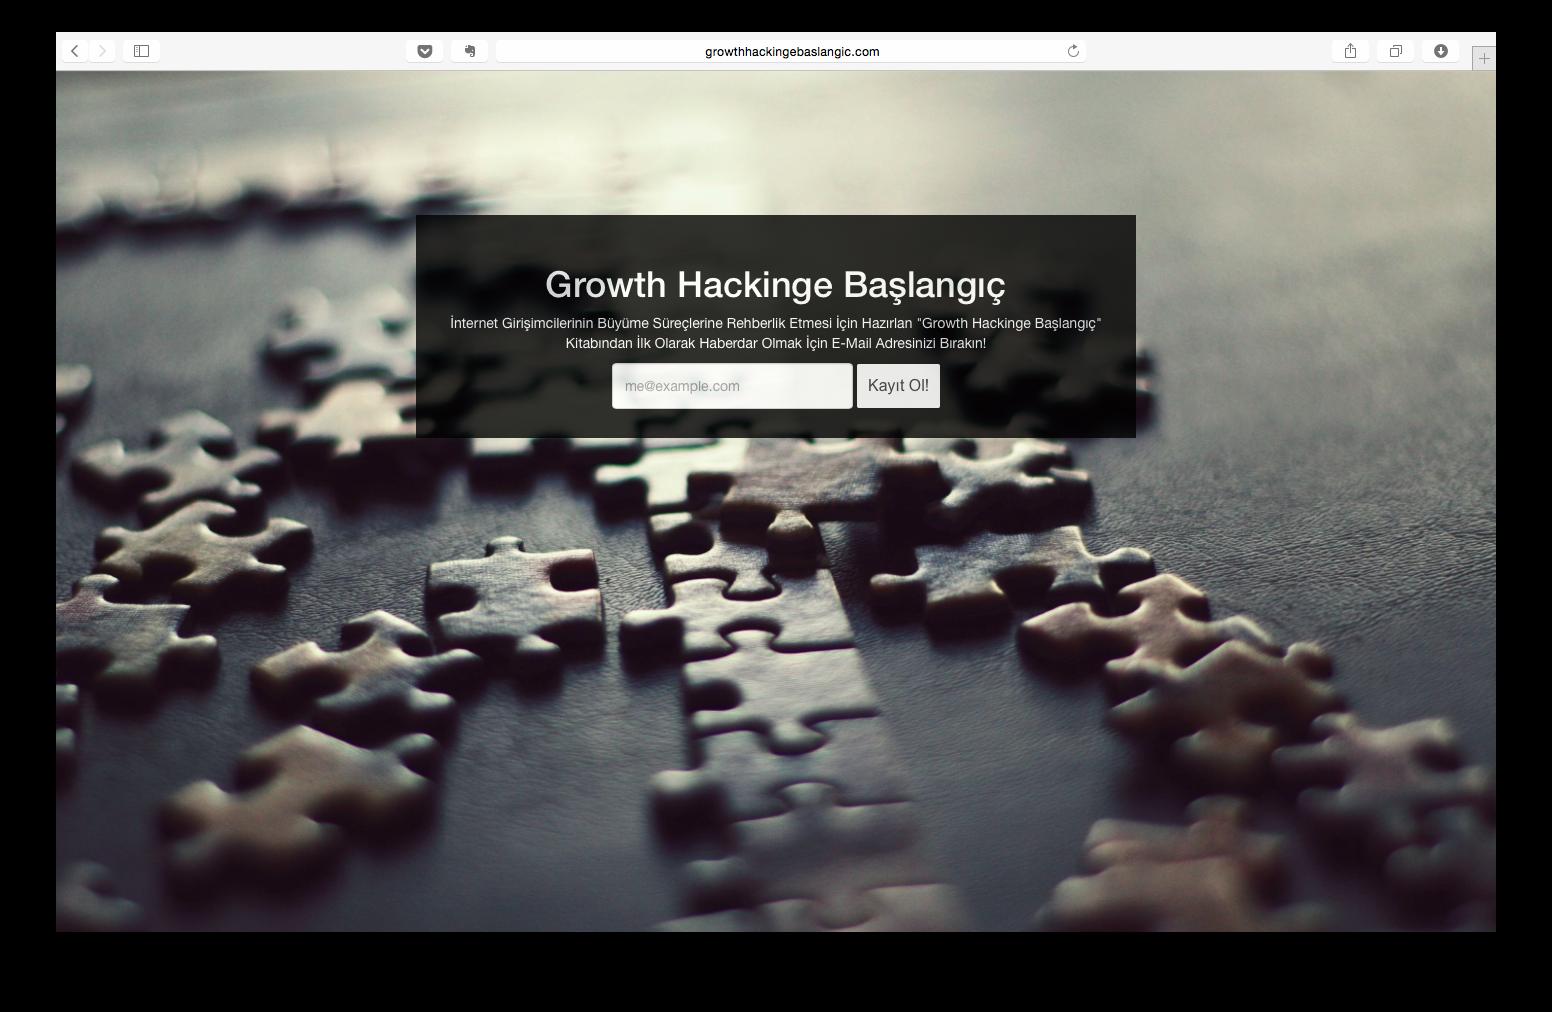 Growth Hackinge Başlangıç